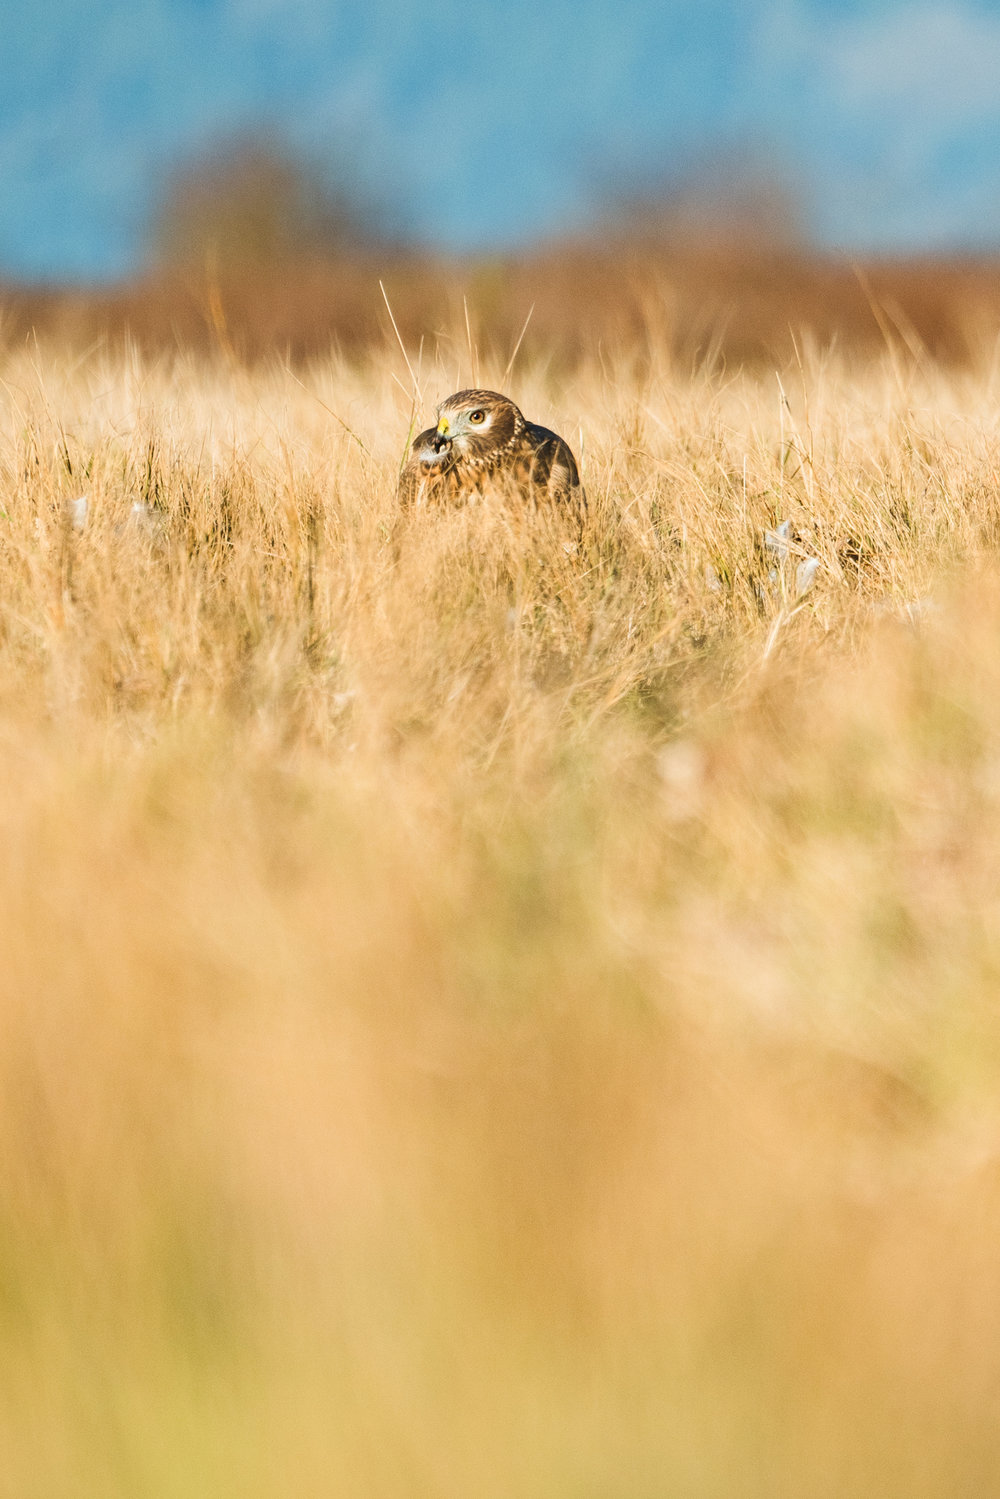 Best Wildlife Photographers in Washington State